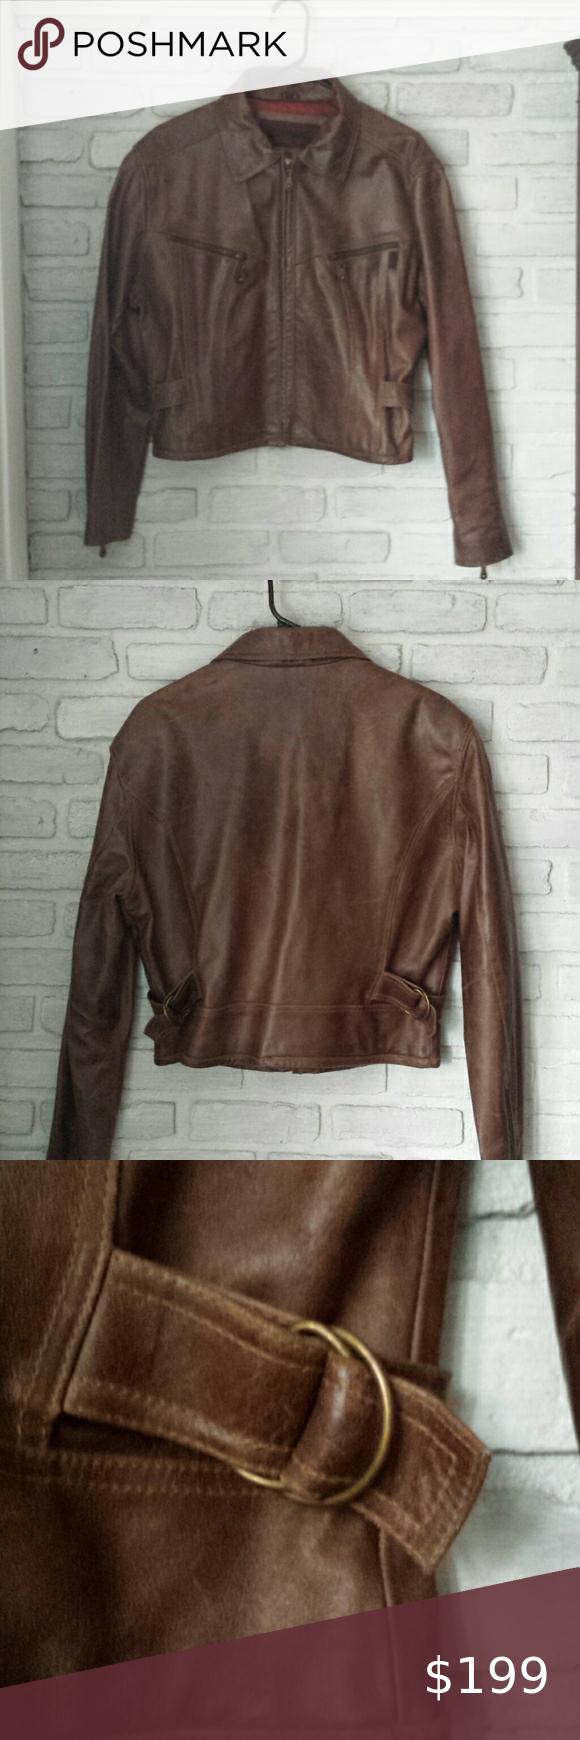 Vintage Guess Brown Leather Bomber Biker Jacket Leather Bomber Jacket Womens Biker Jacket Leather Bomber [ 1740 x 580 Pixel ]